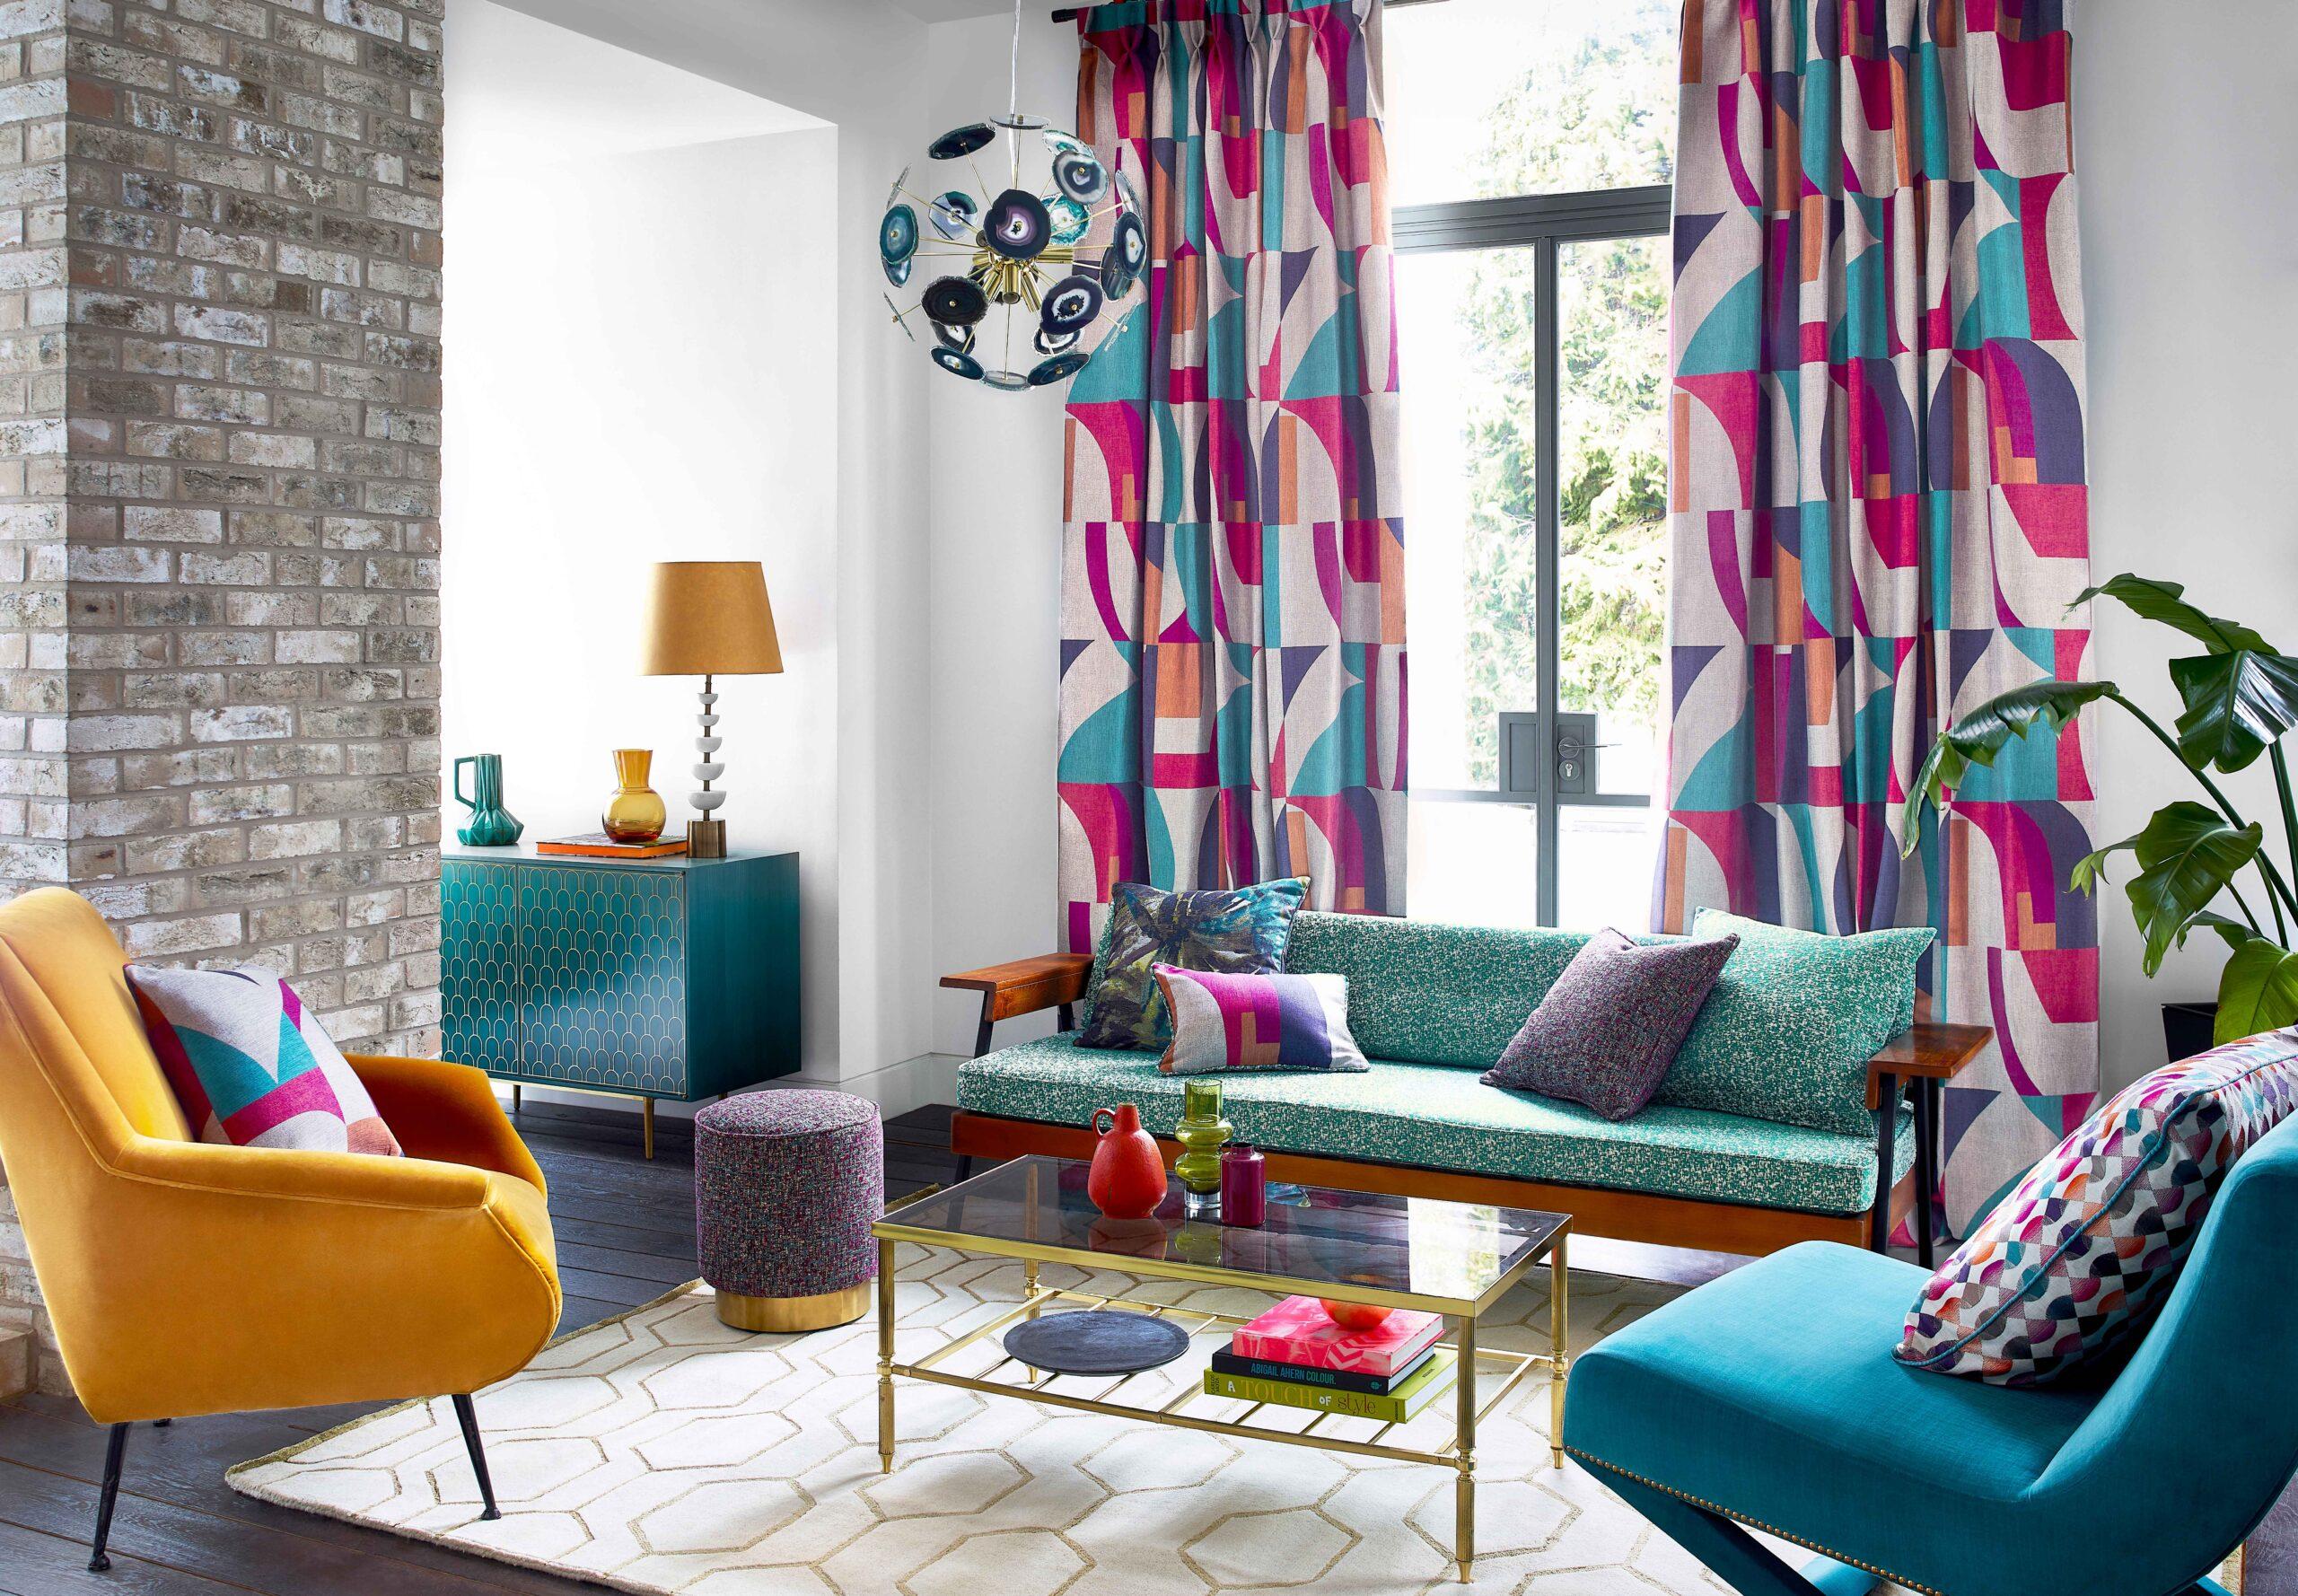 Harlequin Atelier Bodega Fabric